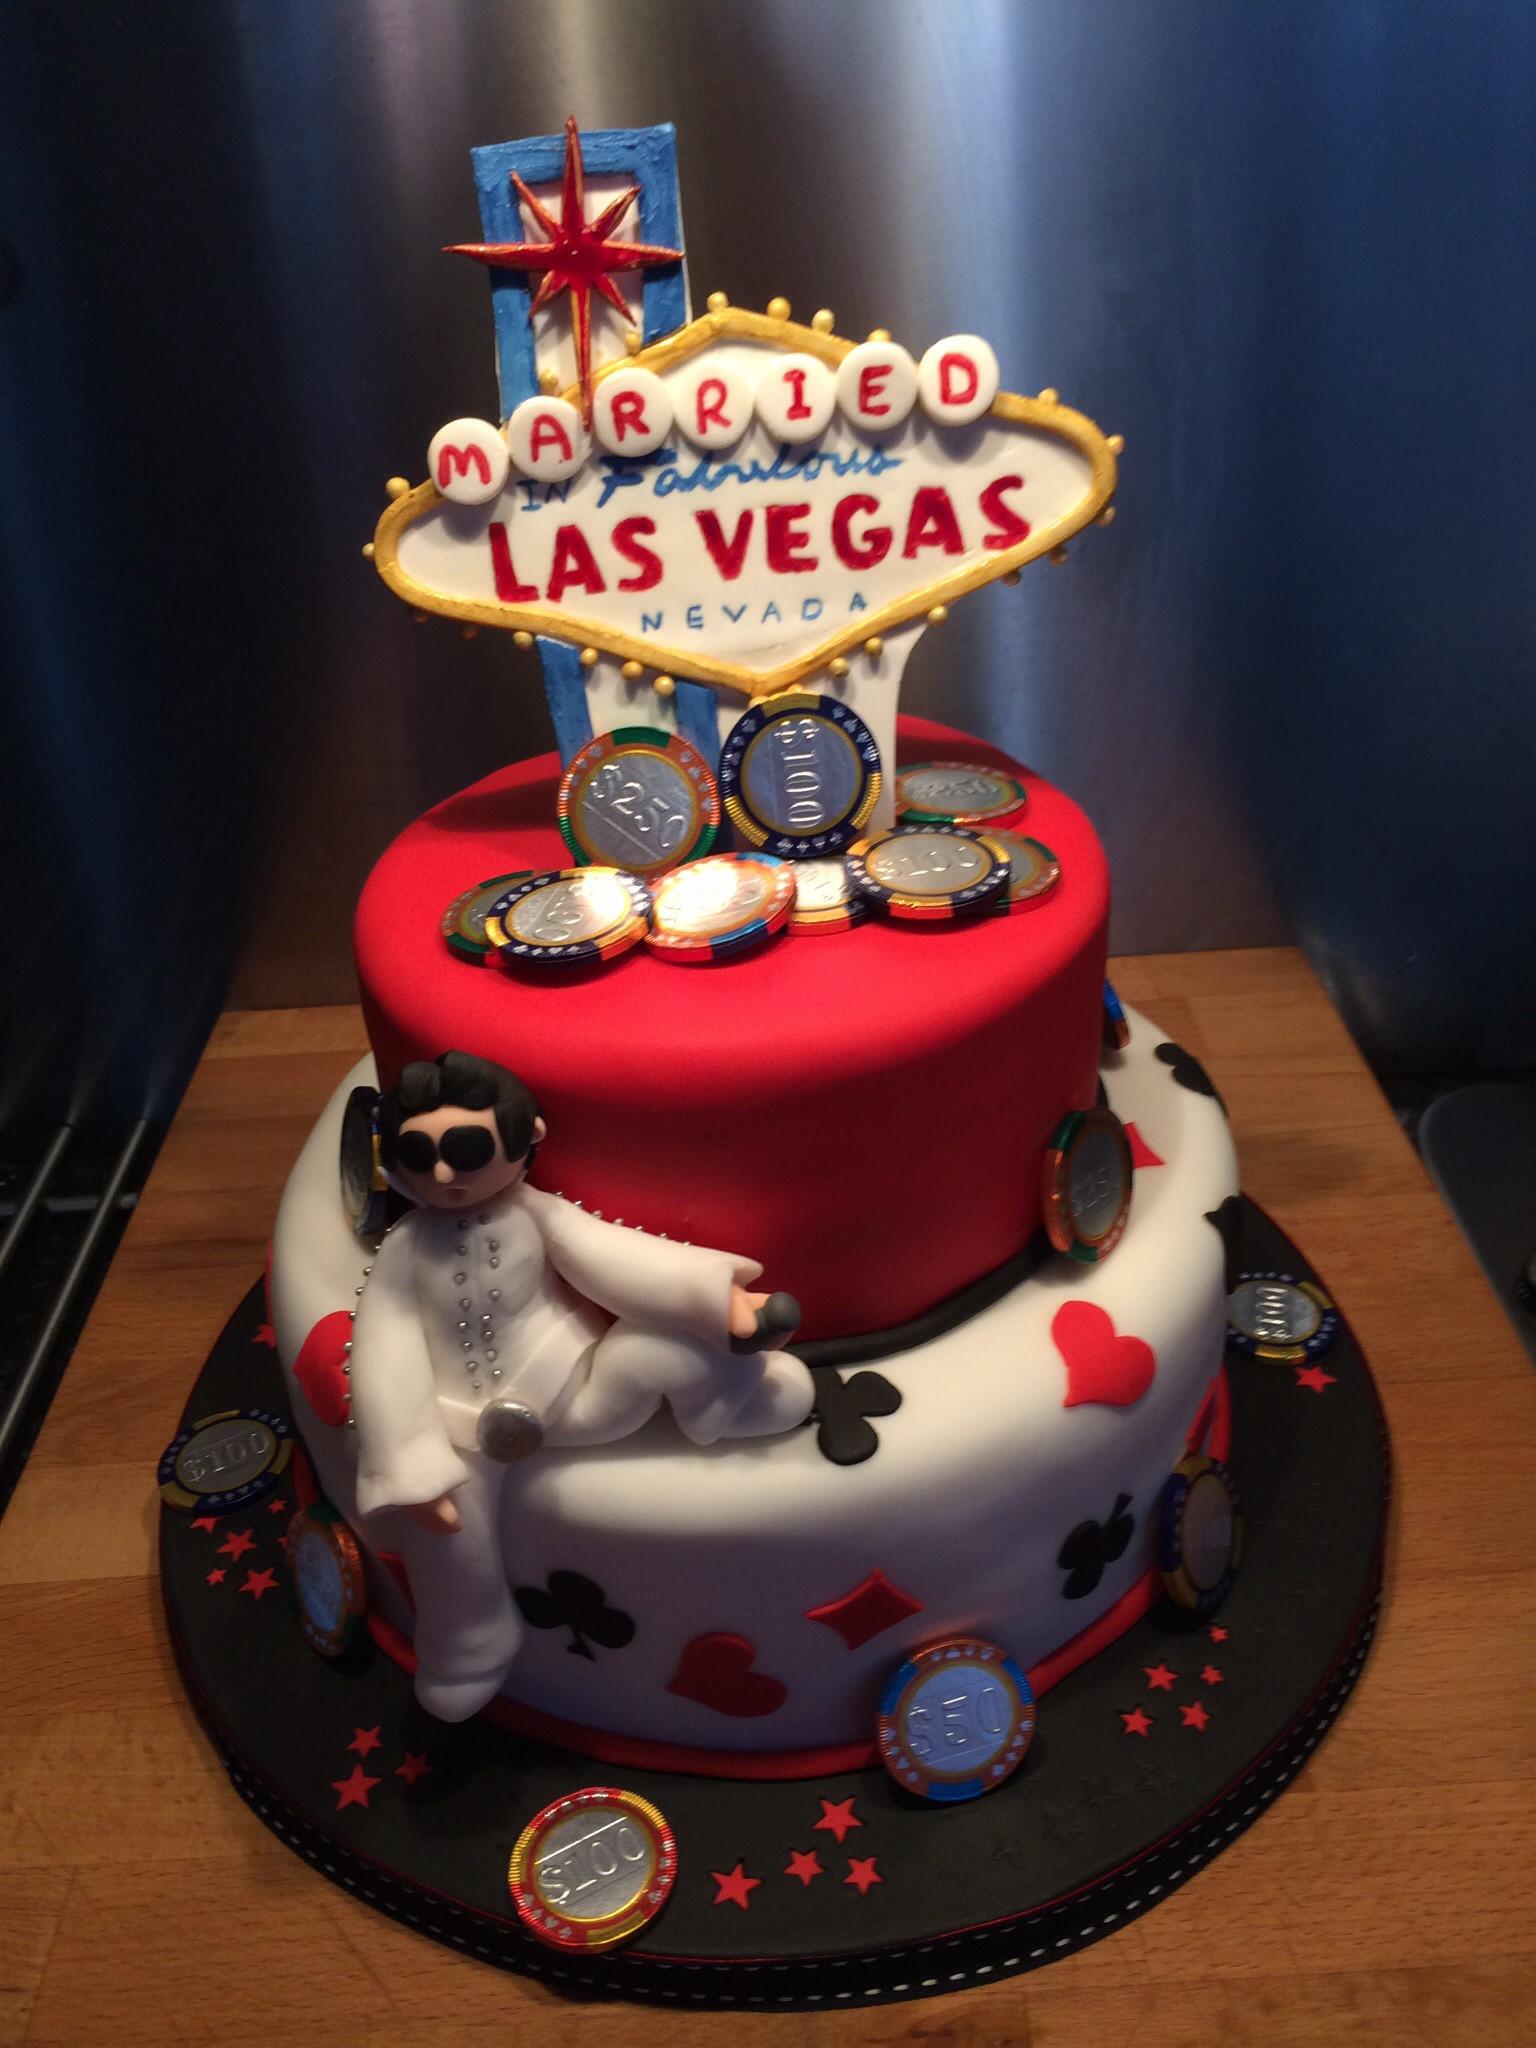 Wedding Cakes In Vegas  Las vegas wedding cakes idea in 2017